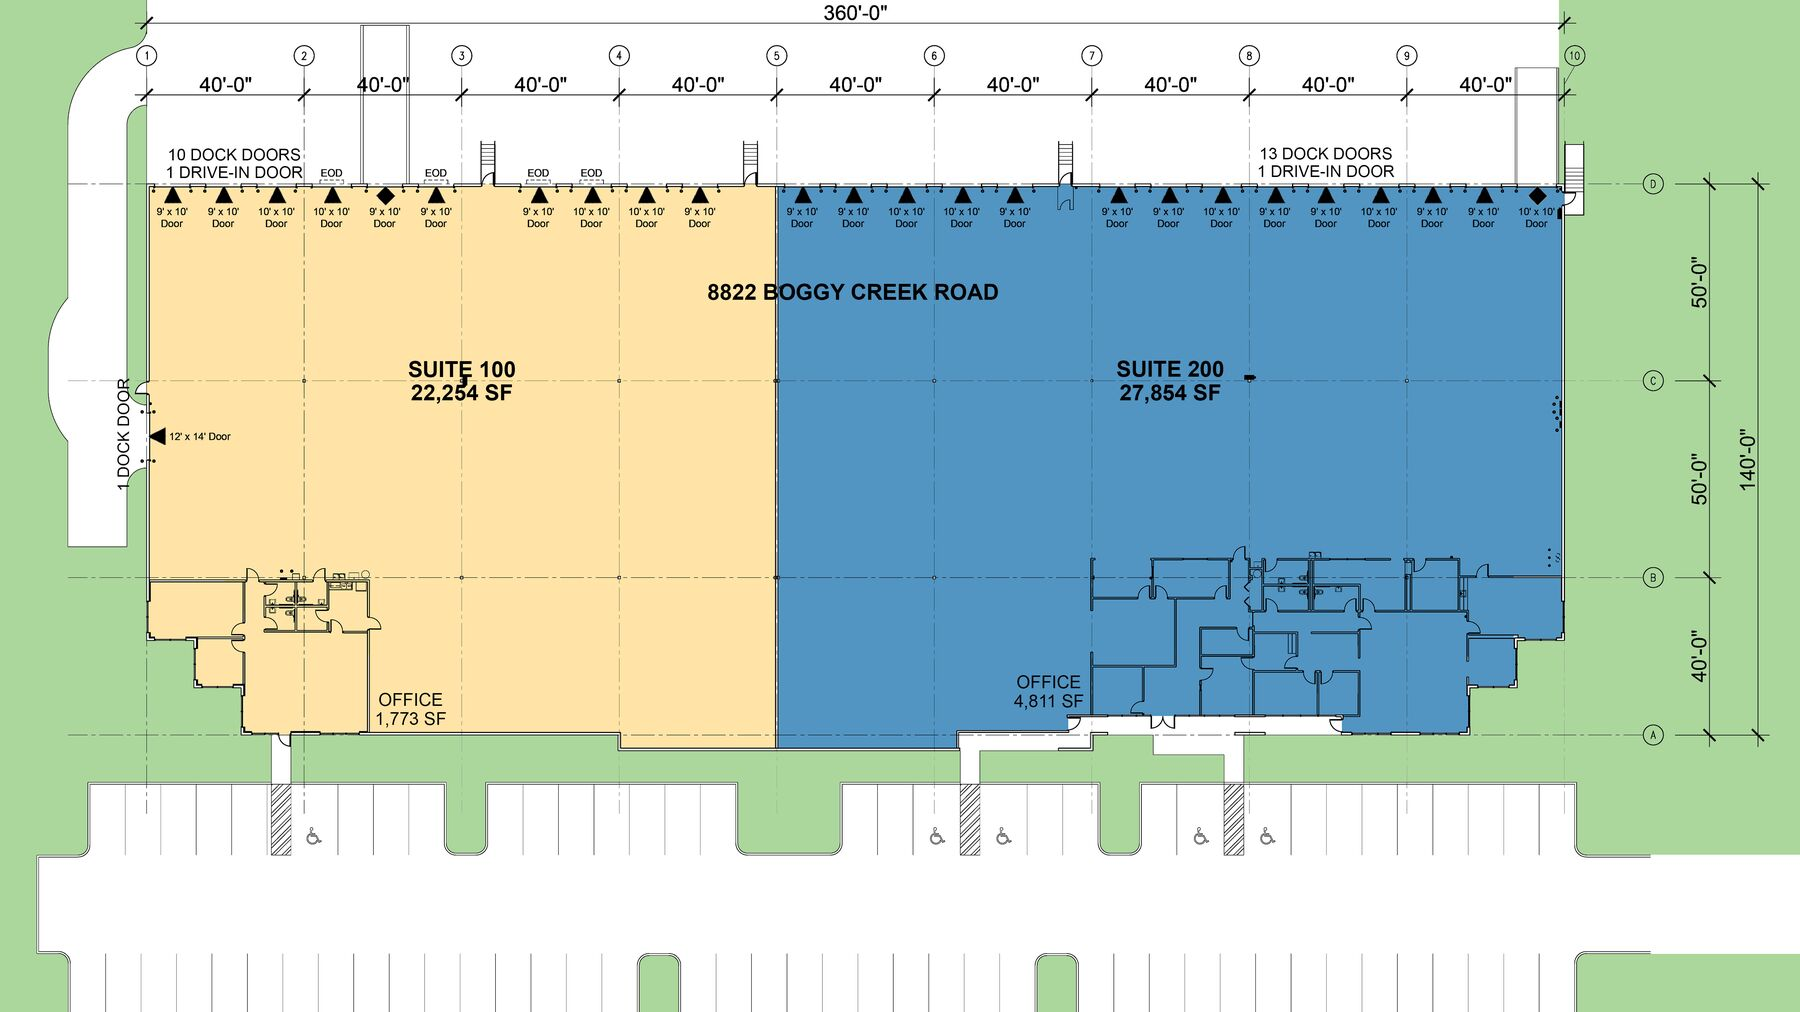 DPM-Prologis-Airport-DC_8822-Boggy-Creek-Rd_Fyer-Plan.jpg